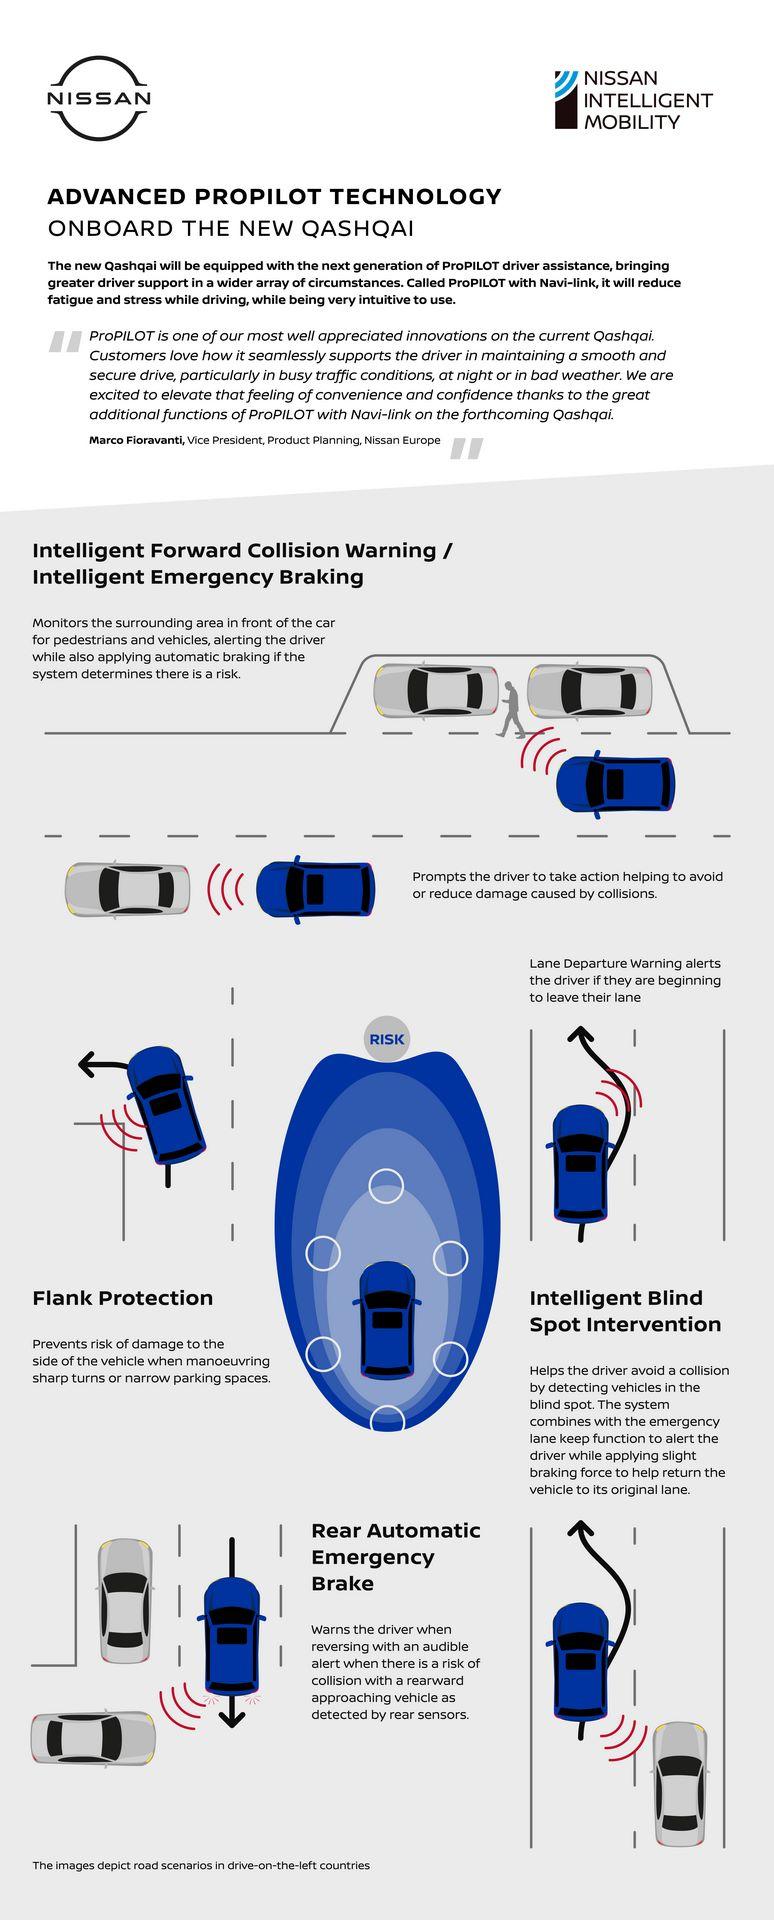 Nissan-Qashqai-Propilot-Navi-Infographic-V4P1